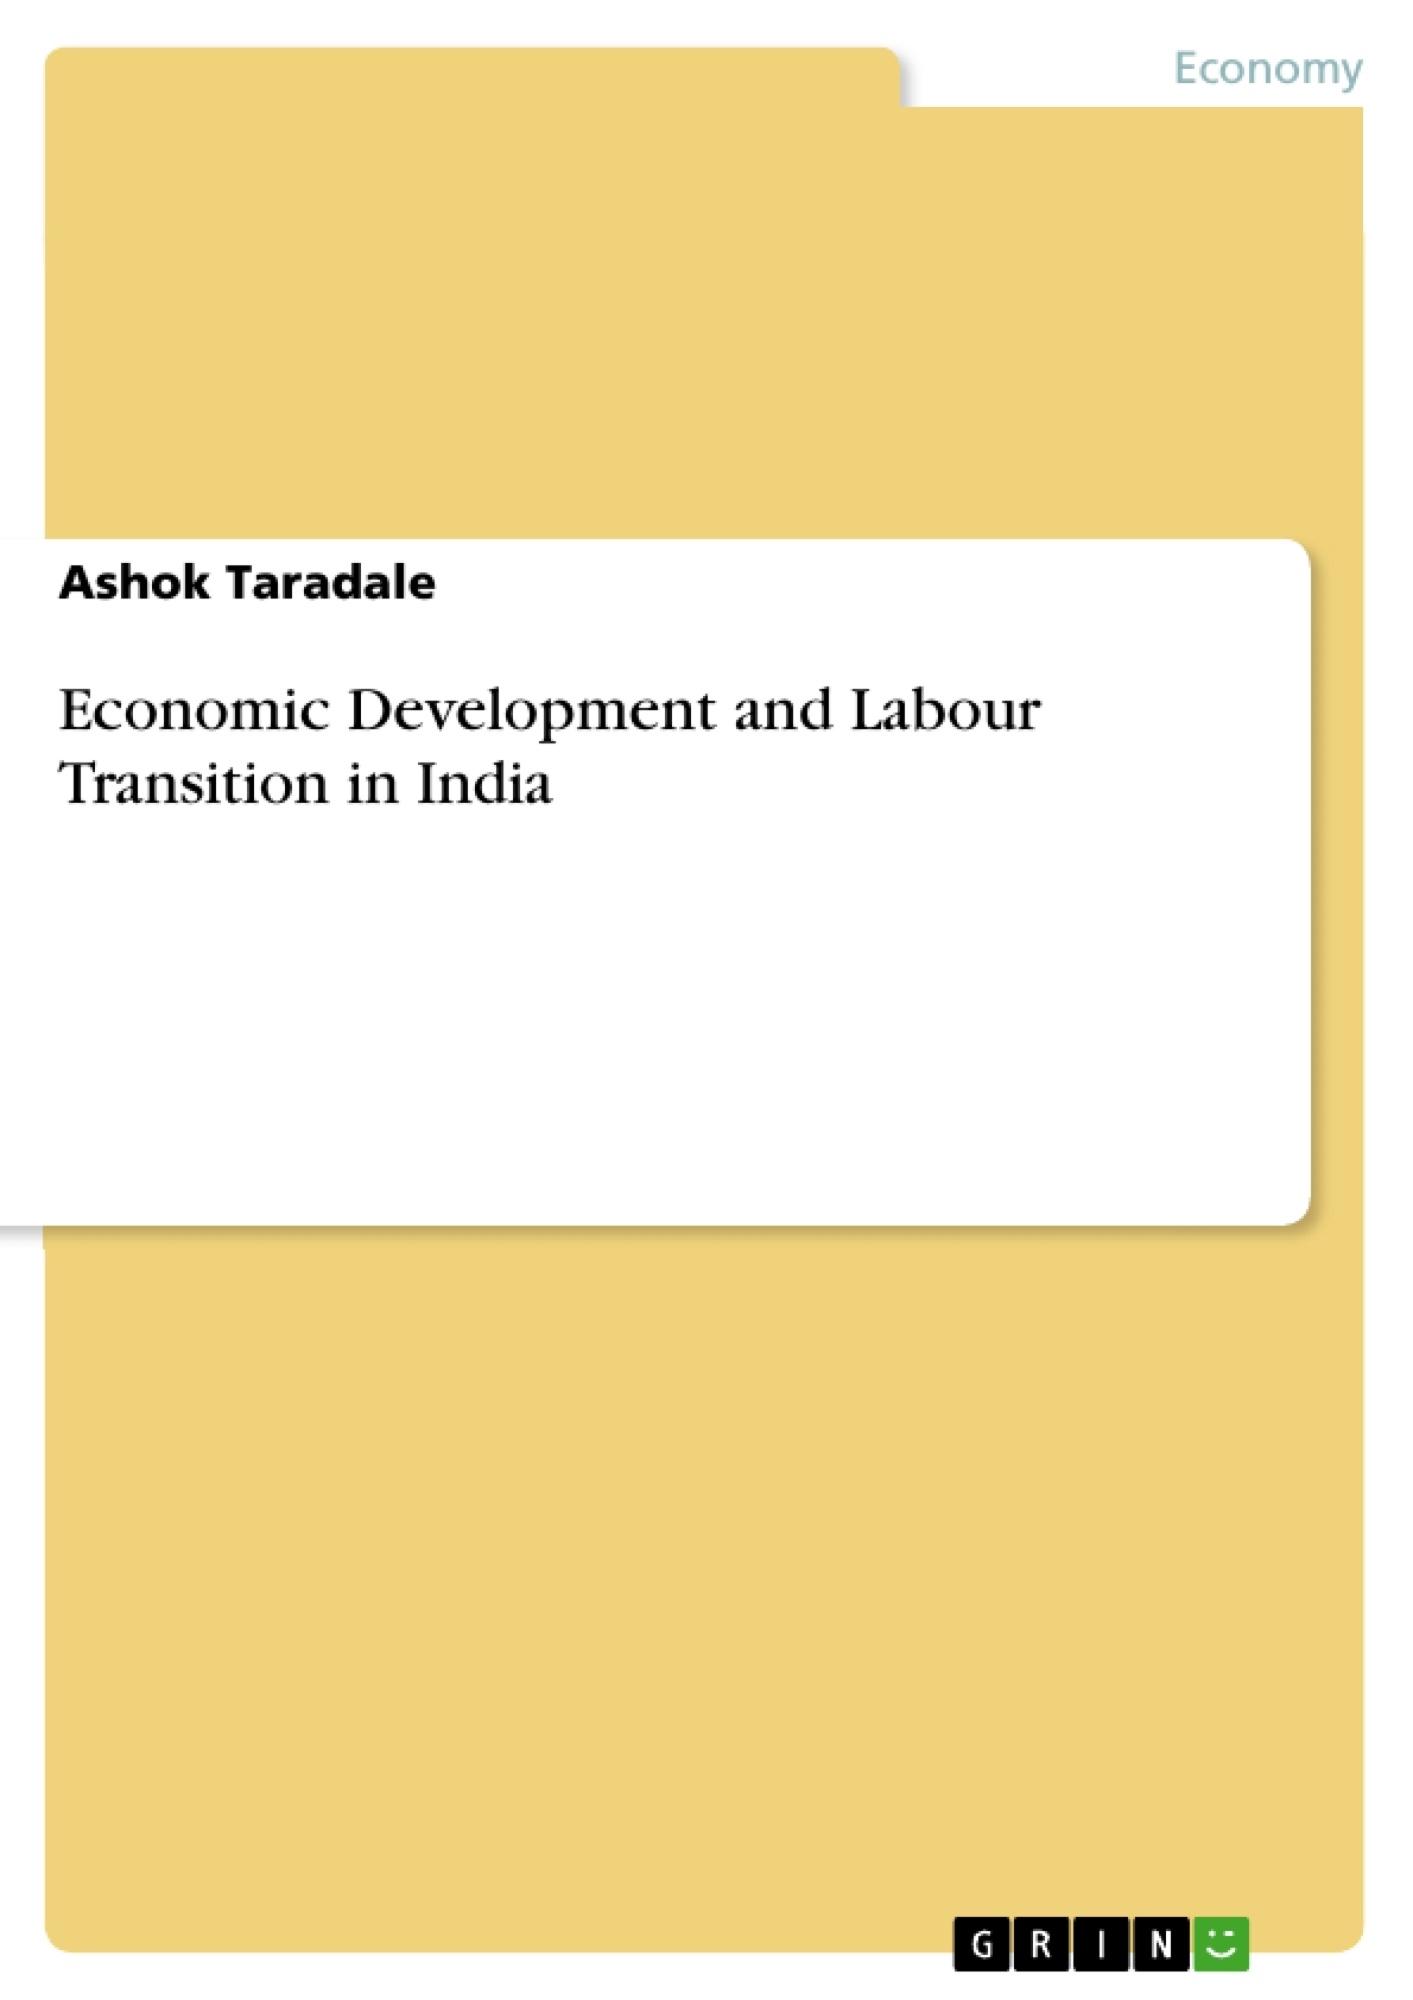 Title: Economic Development and Labour Transition in India